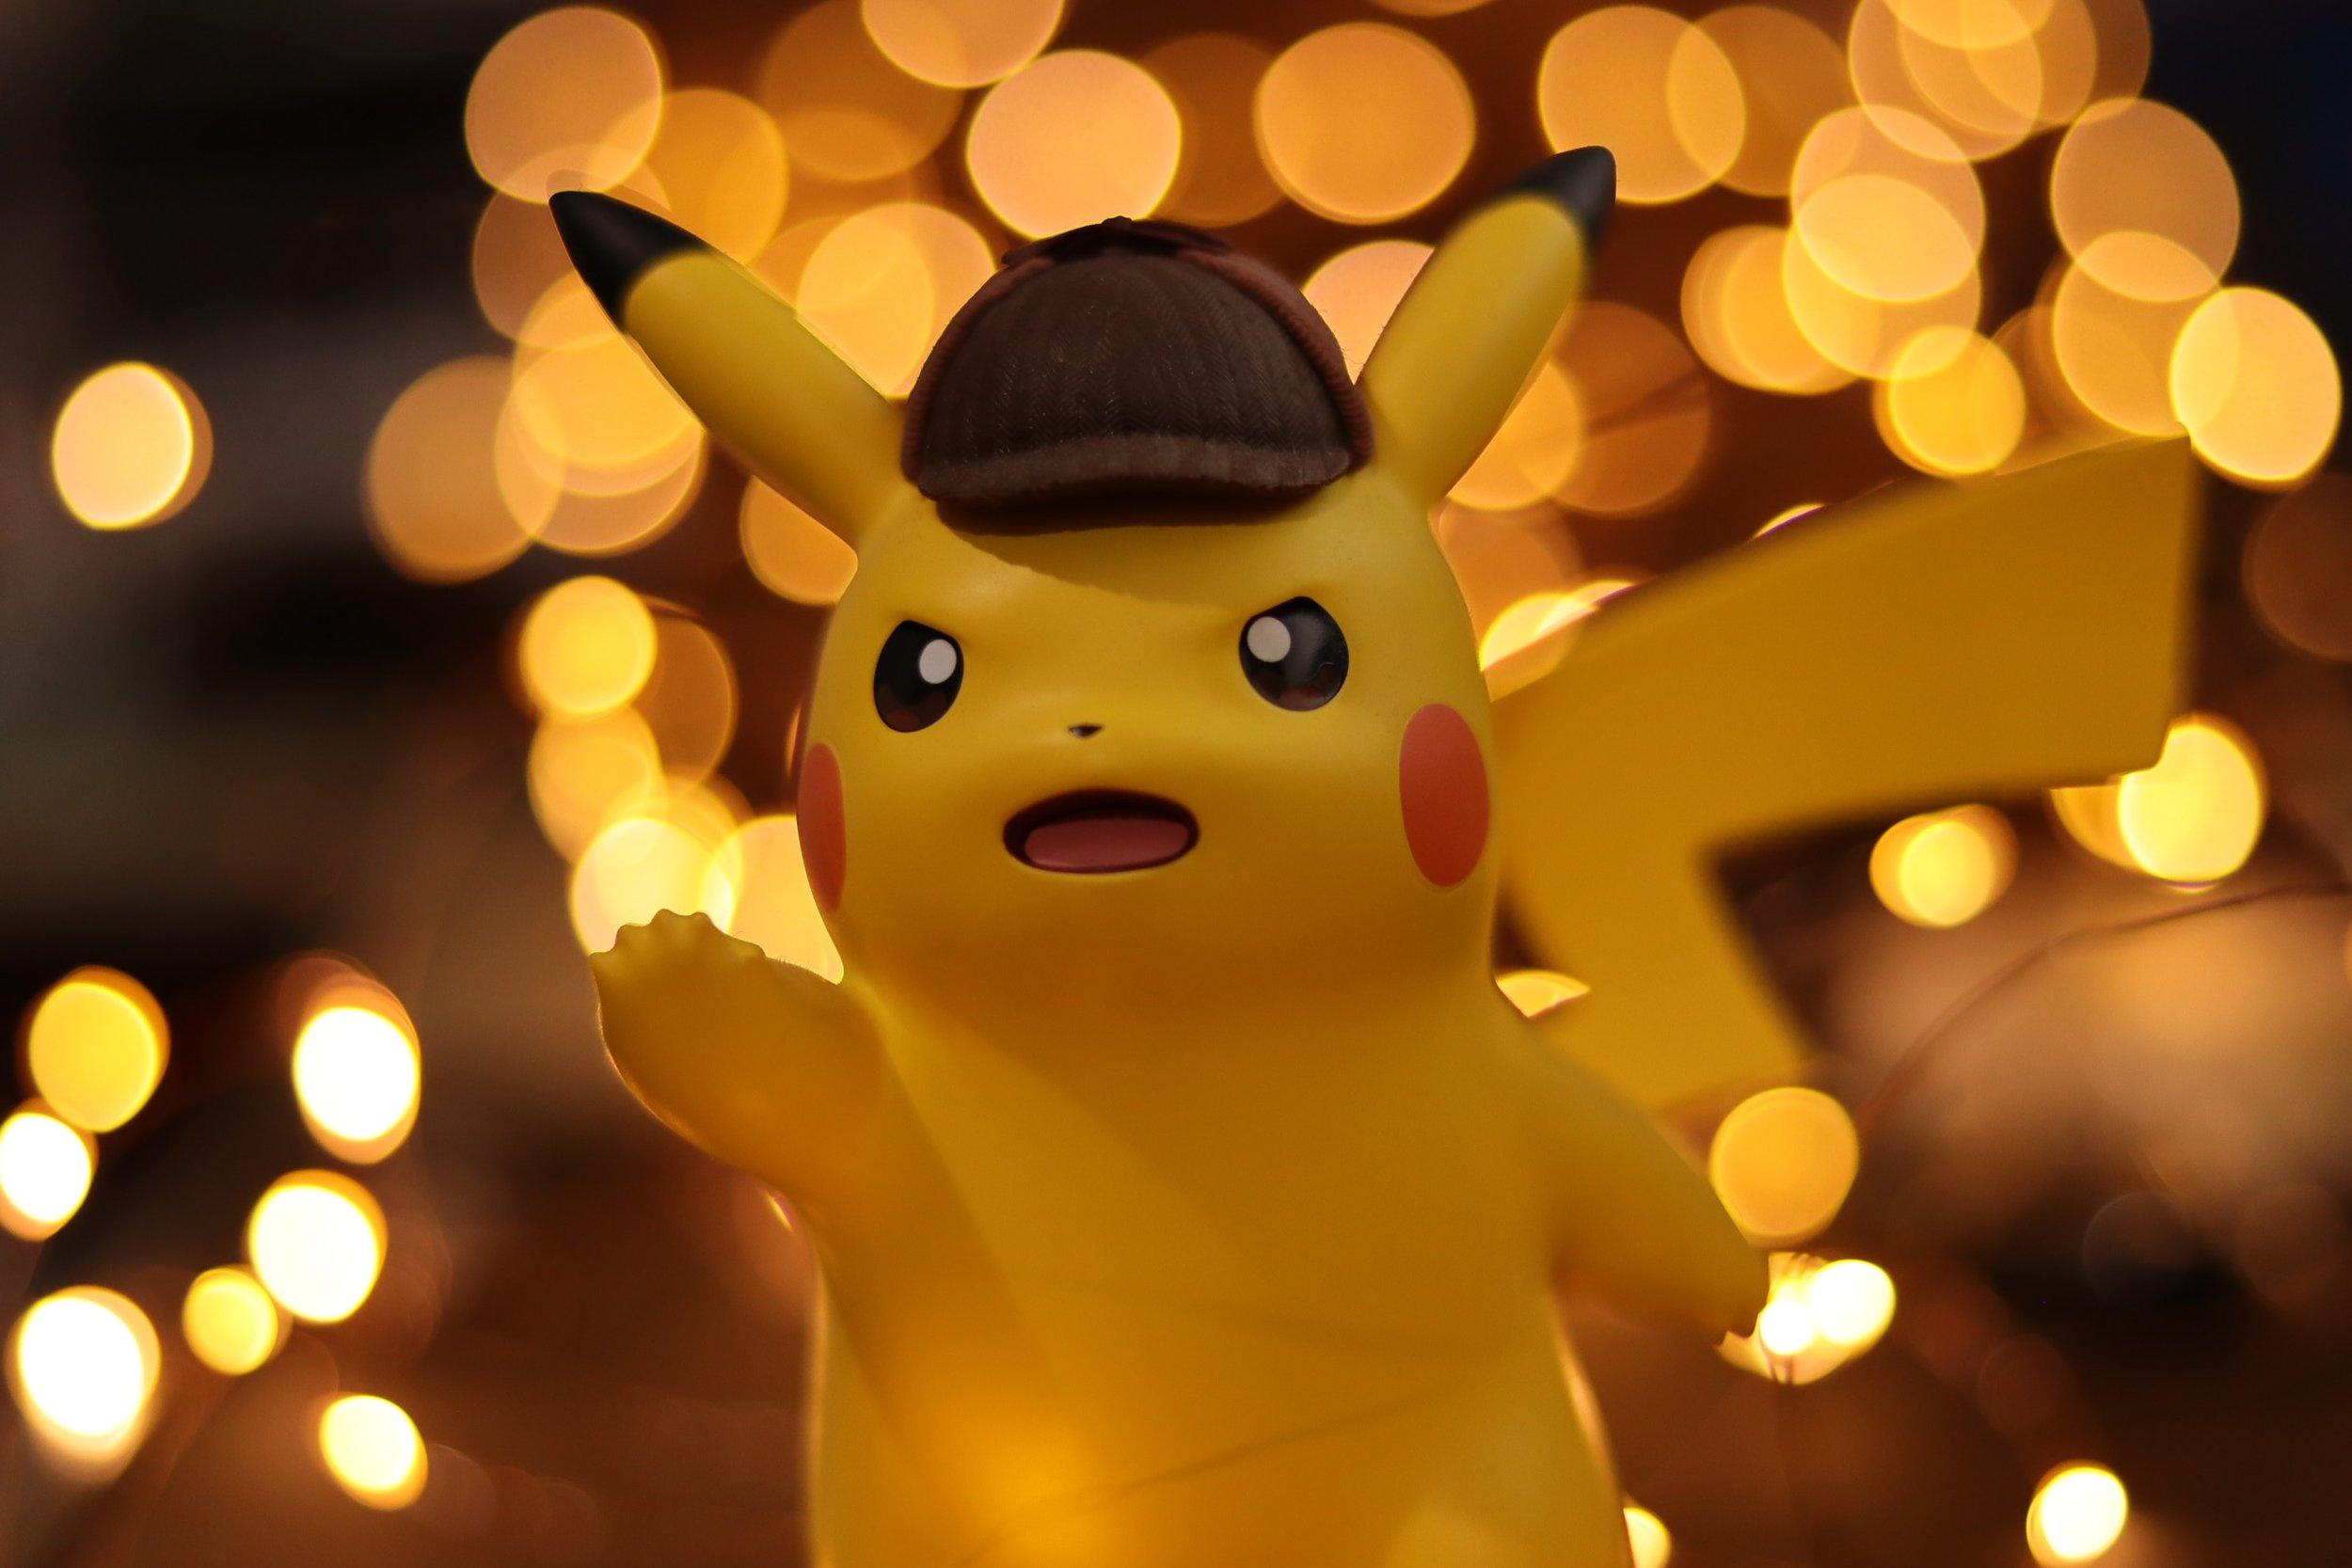 close-up-figurine-pikachu-pokemon-1716861.jpg